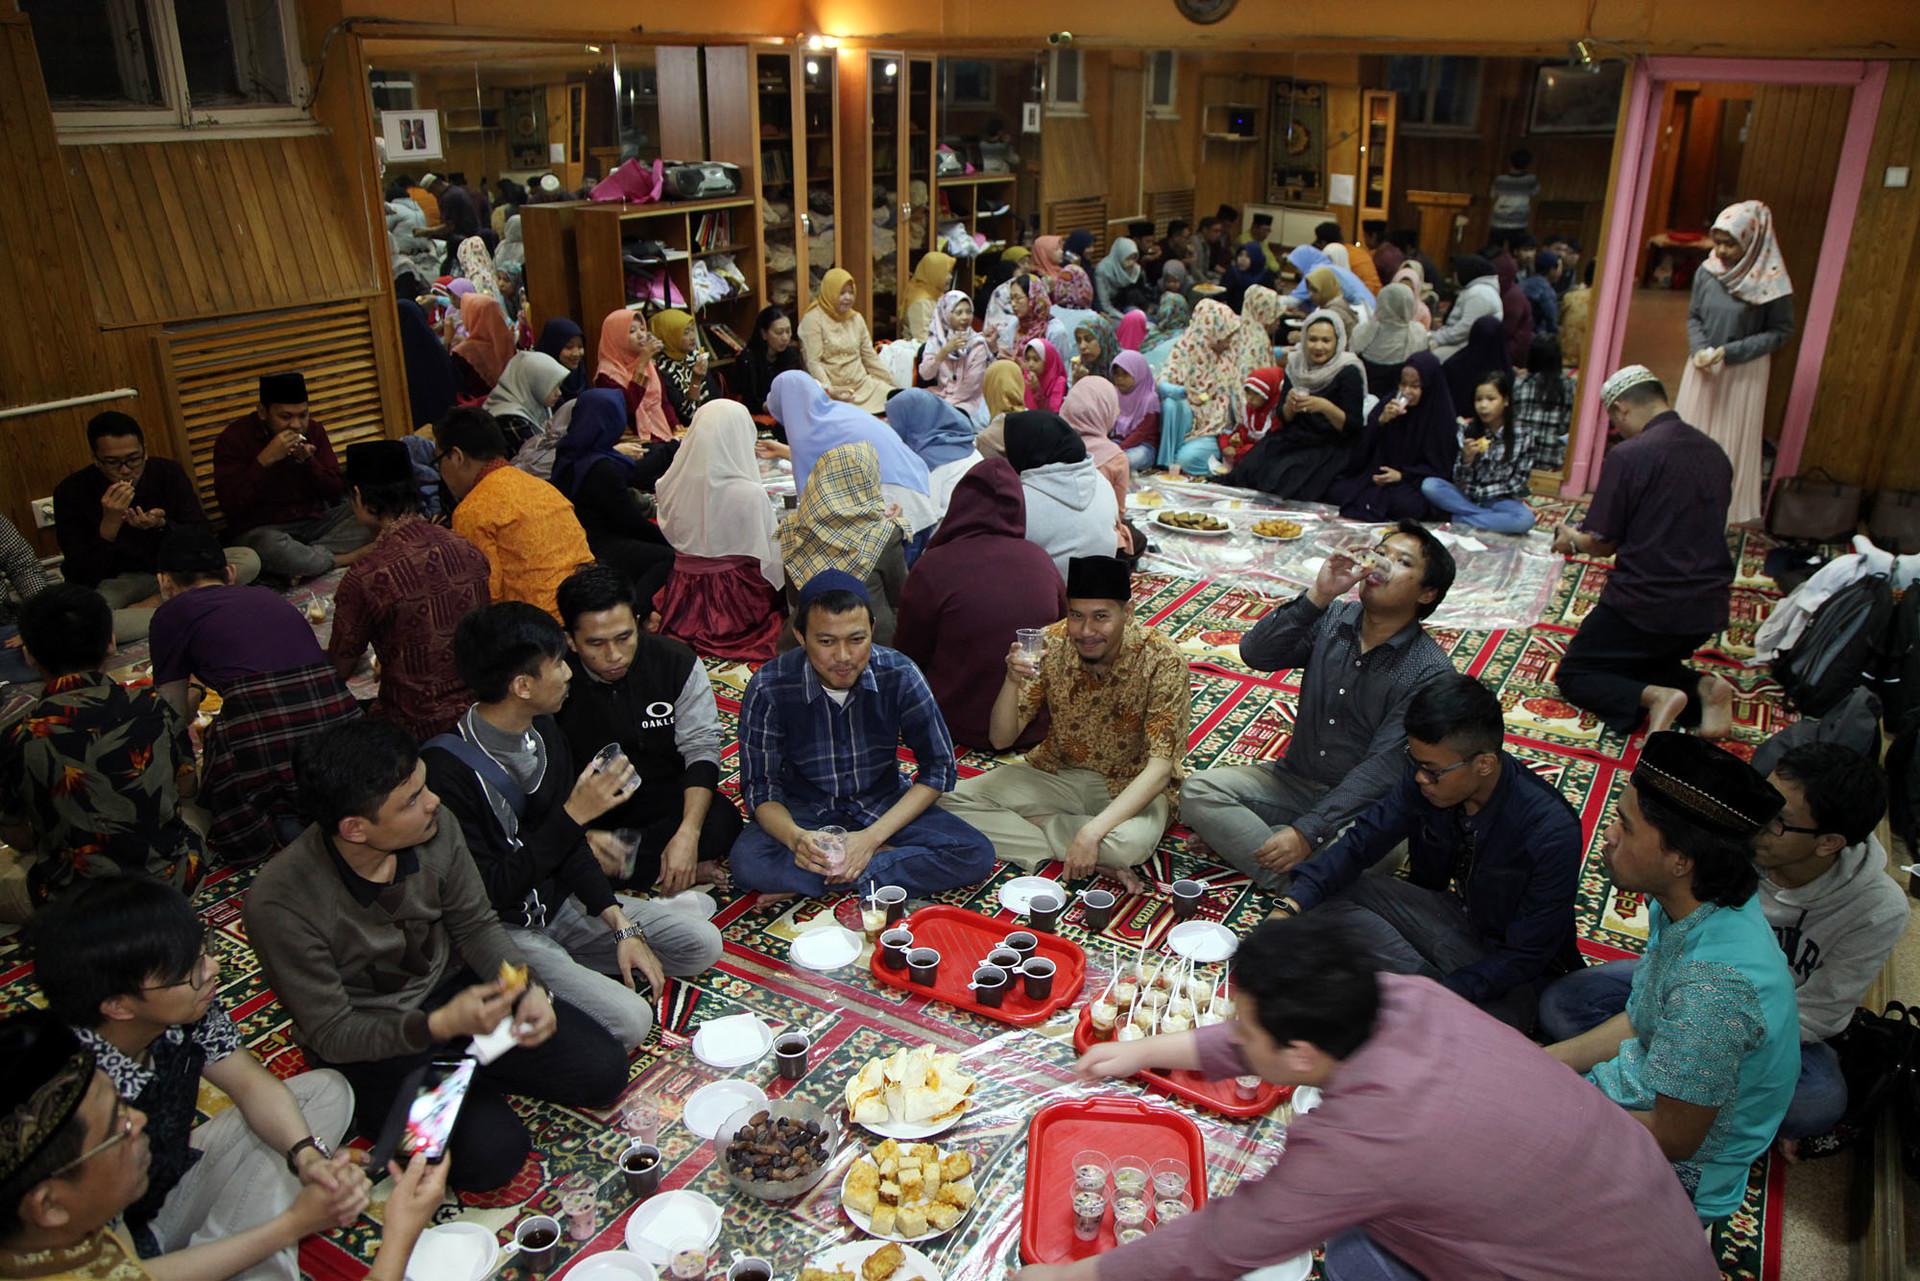 Puluhan warga negara Indonesia (WNI) mengikuti acara berbuka puasa bersama yang diselenggarakan oleh Himpunan Persaudaraan Islam Indonesia (HPII) di Mushola Kedutaan Besar Republik Indonesia (KBRI) Moskow, Rusia, Sabtu (26/5/2018).